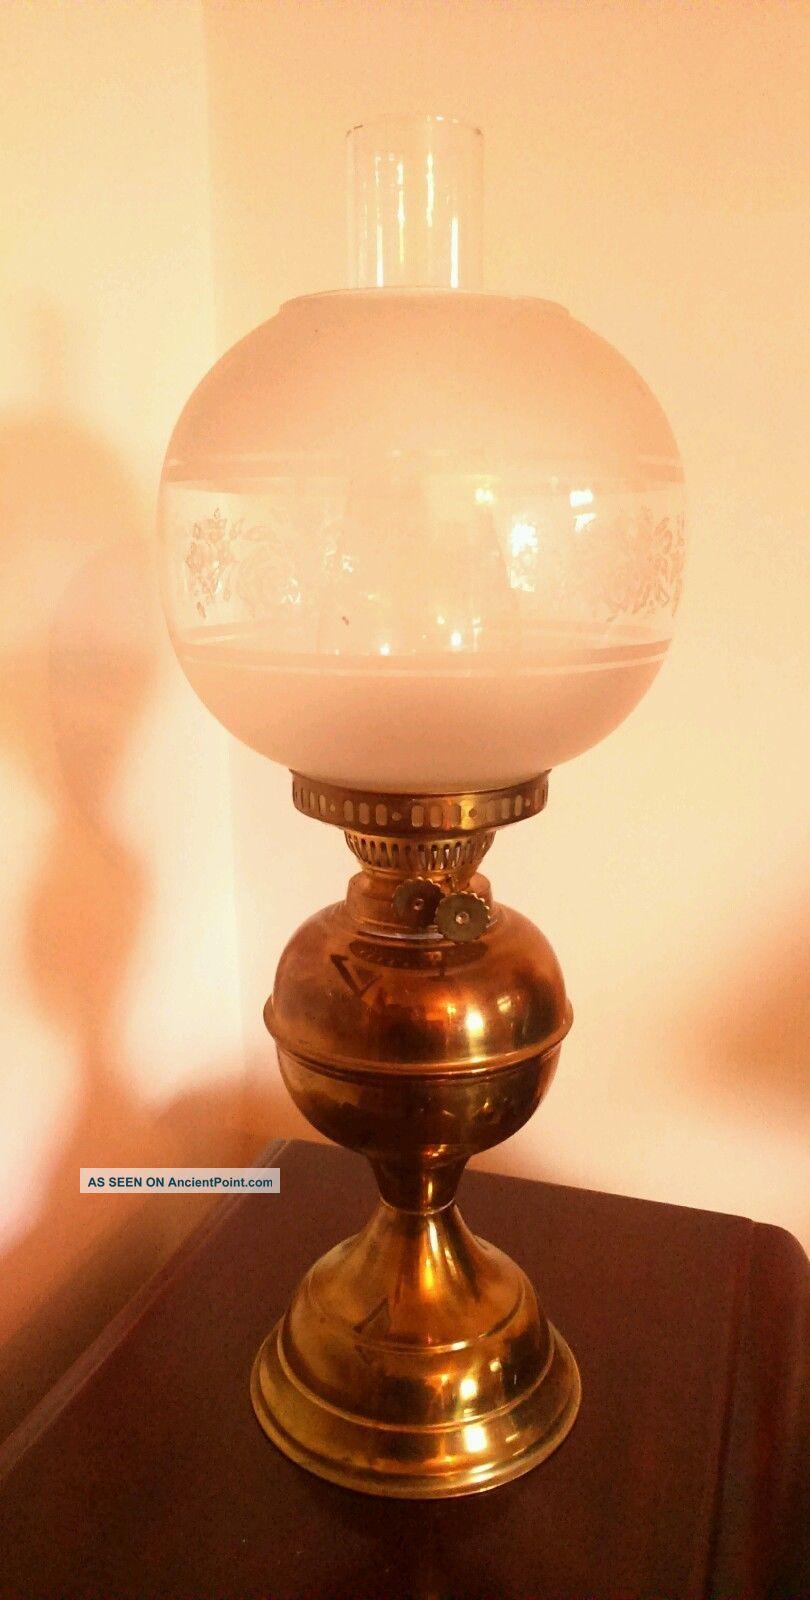 Vintage Brass Oil Lamp 20th Century photo